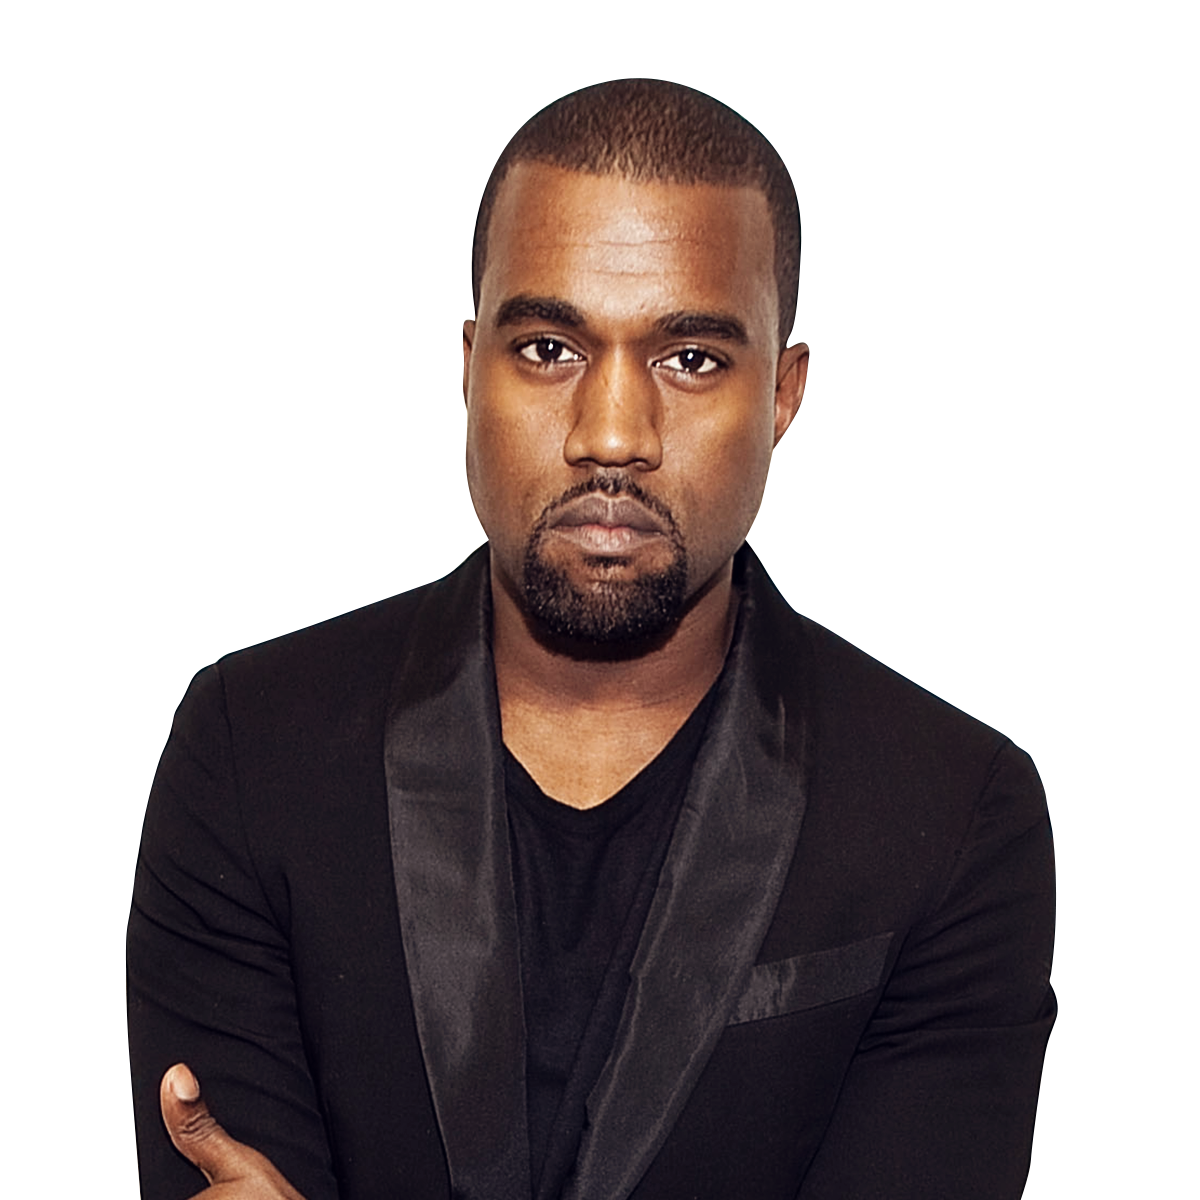 Kanye West Suit PNG Image.